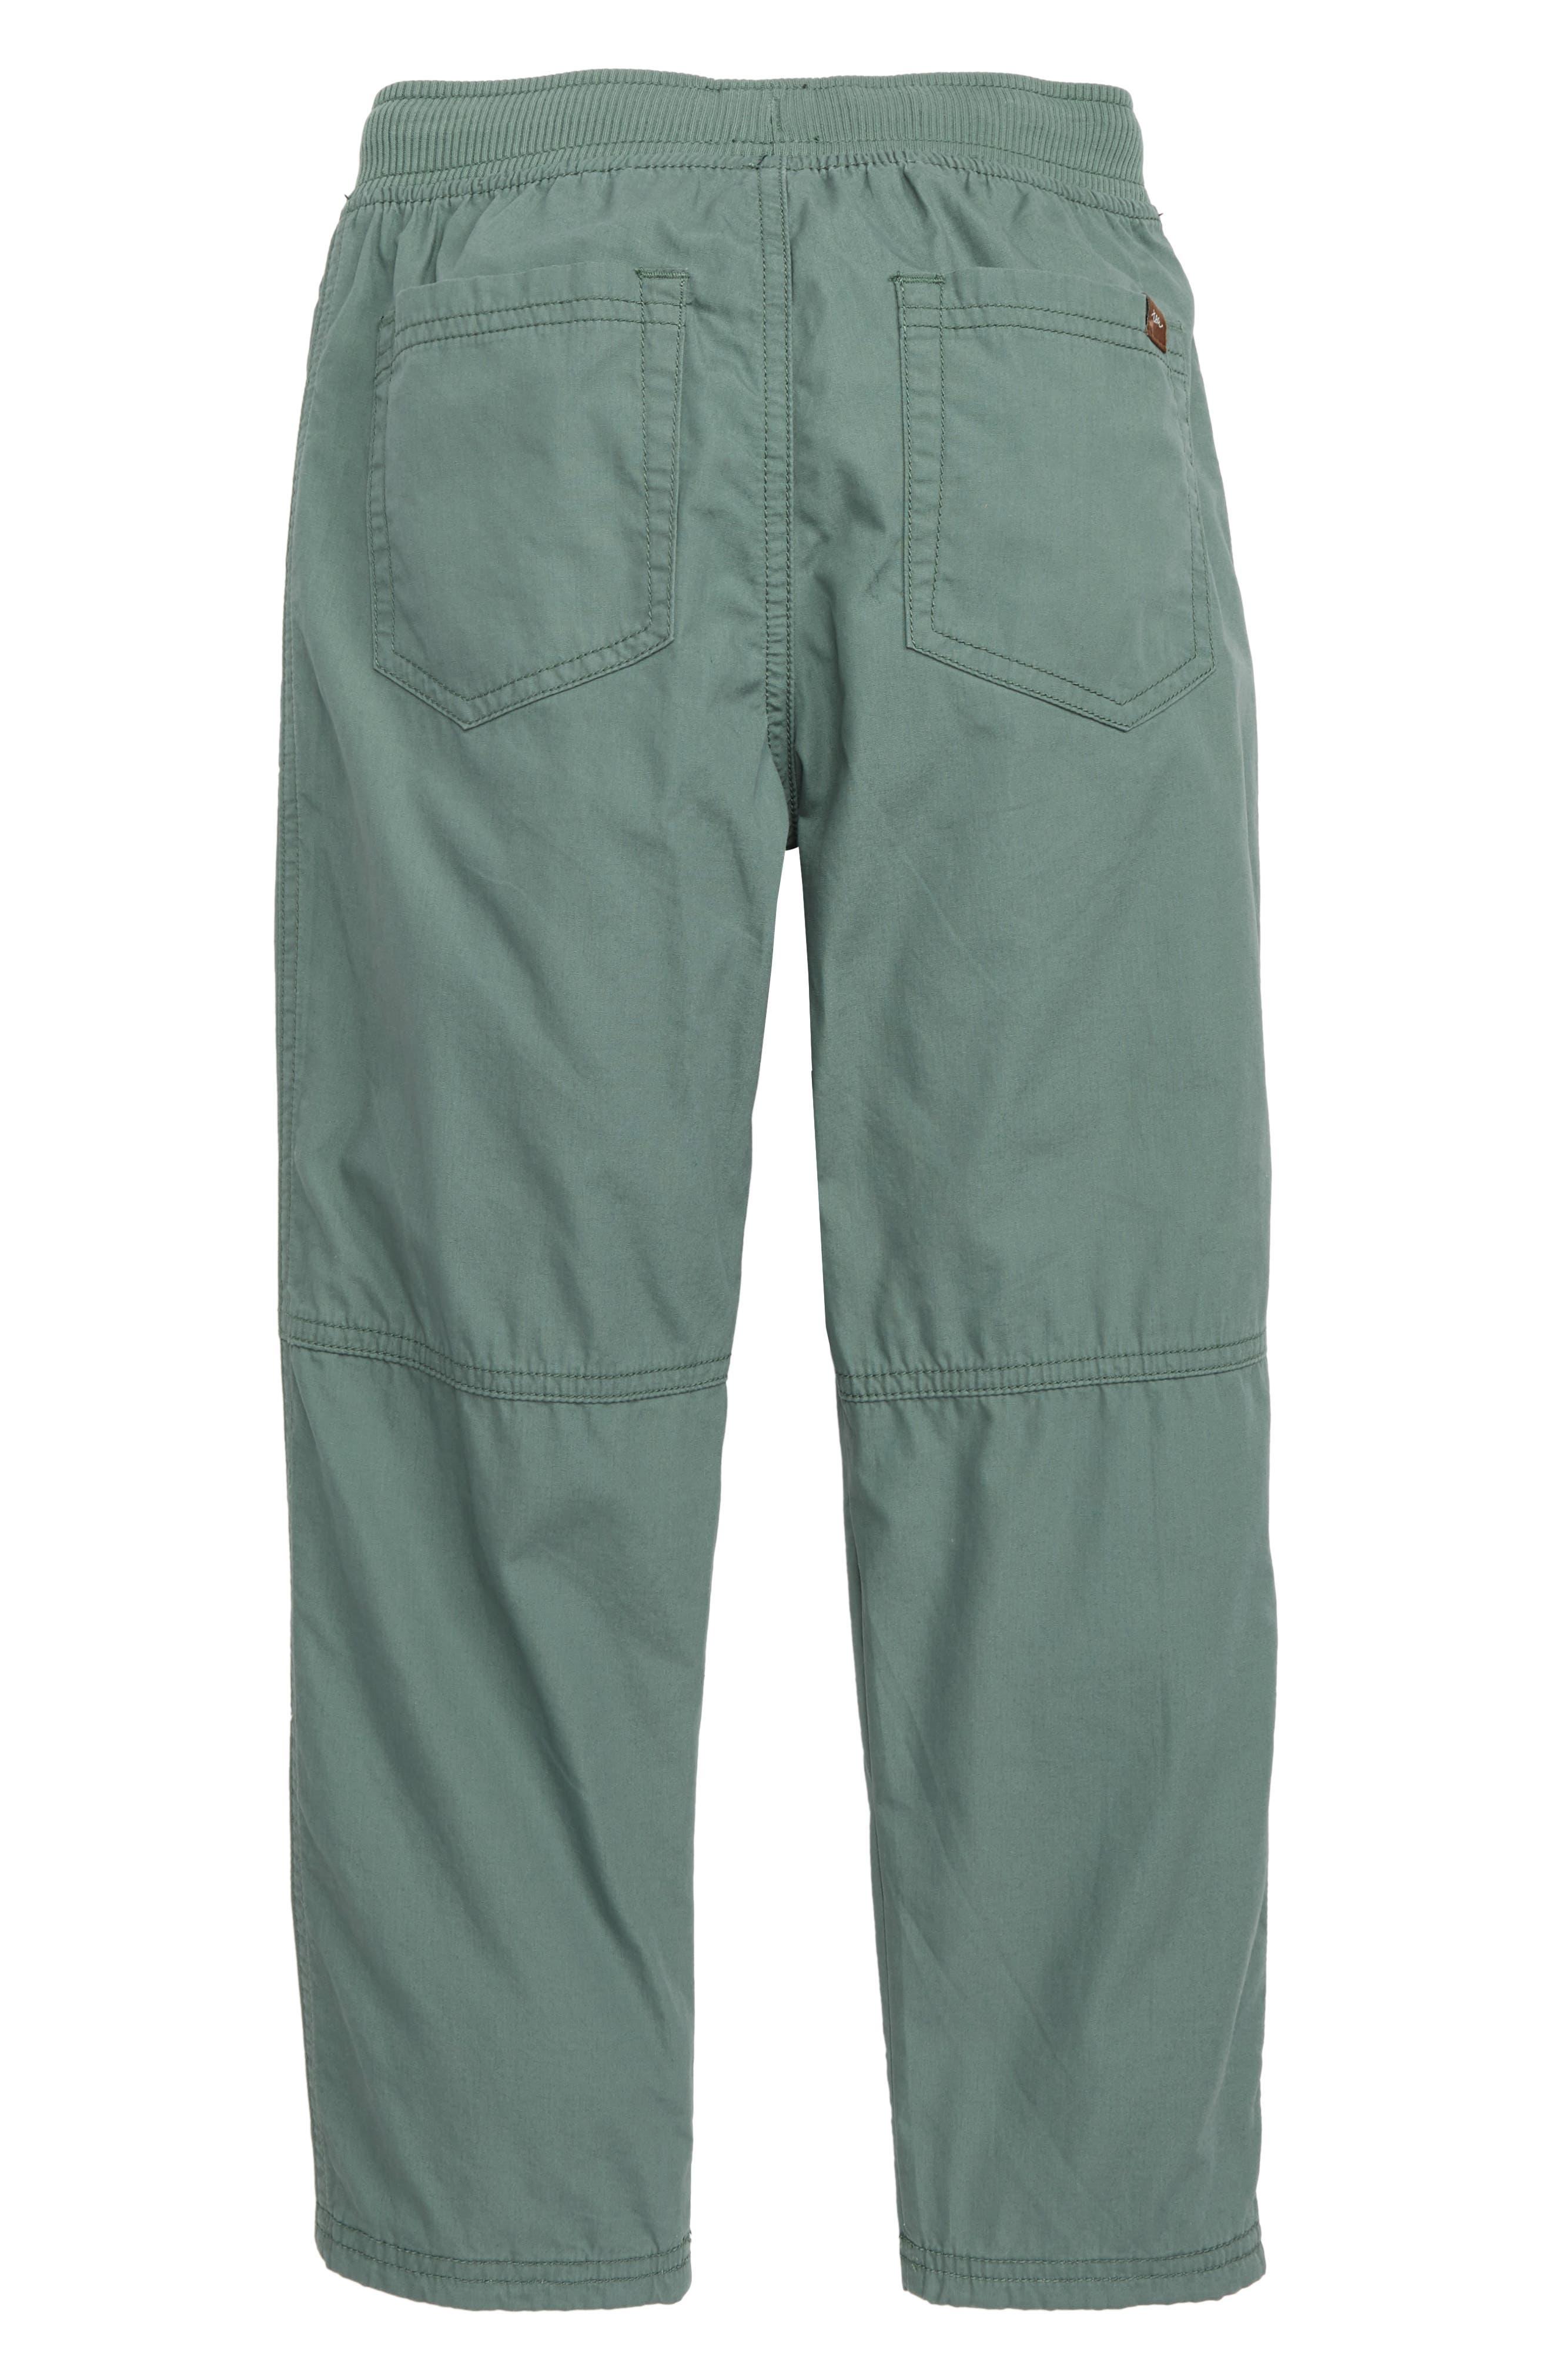 Lined Pants,                             Alternate thumbnail 2, color,                             FOLIAGE